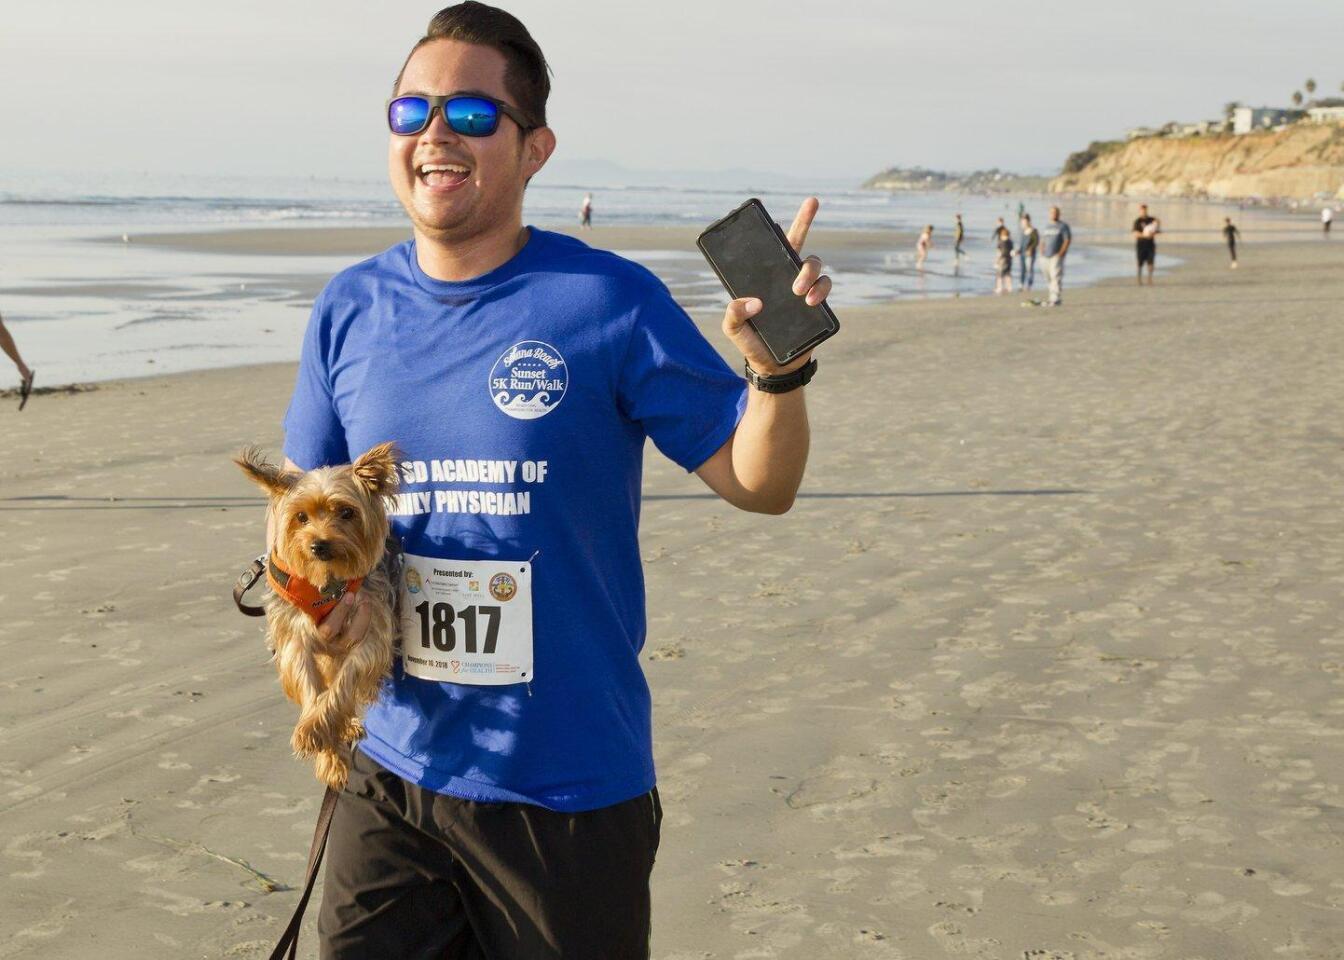 Solana Beach Sunset 5K Fun Run/Walk and Wellness Expo